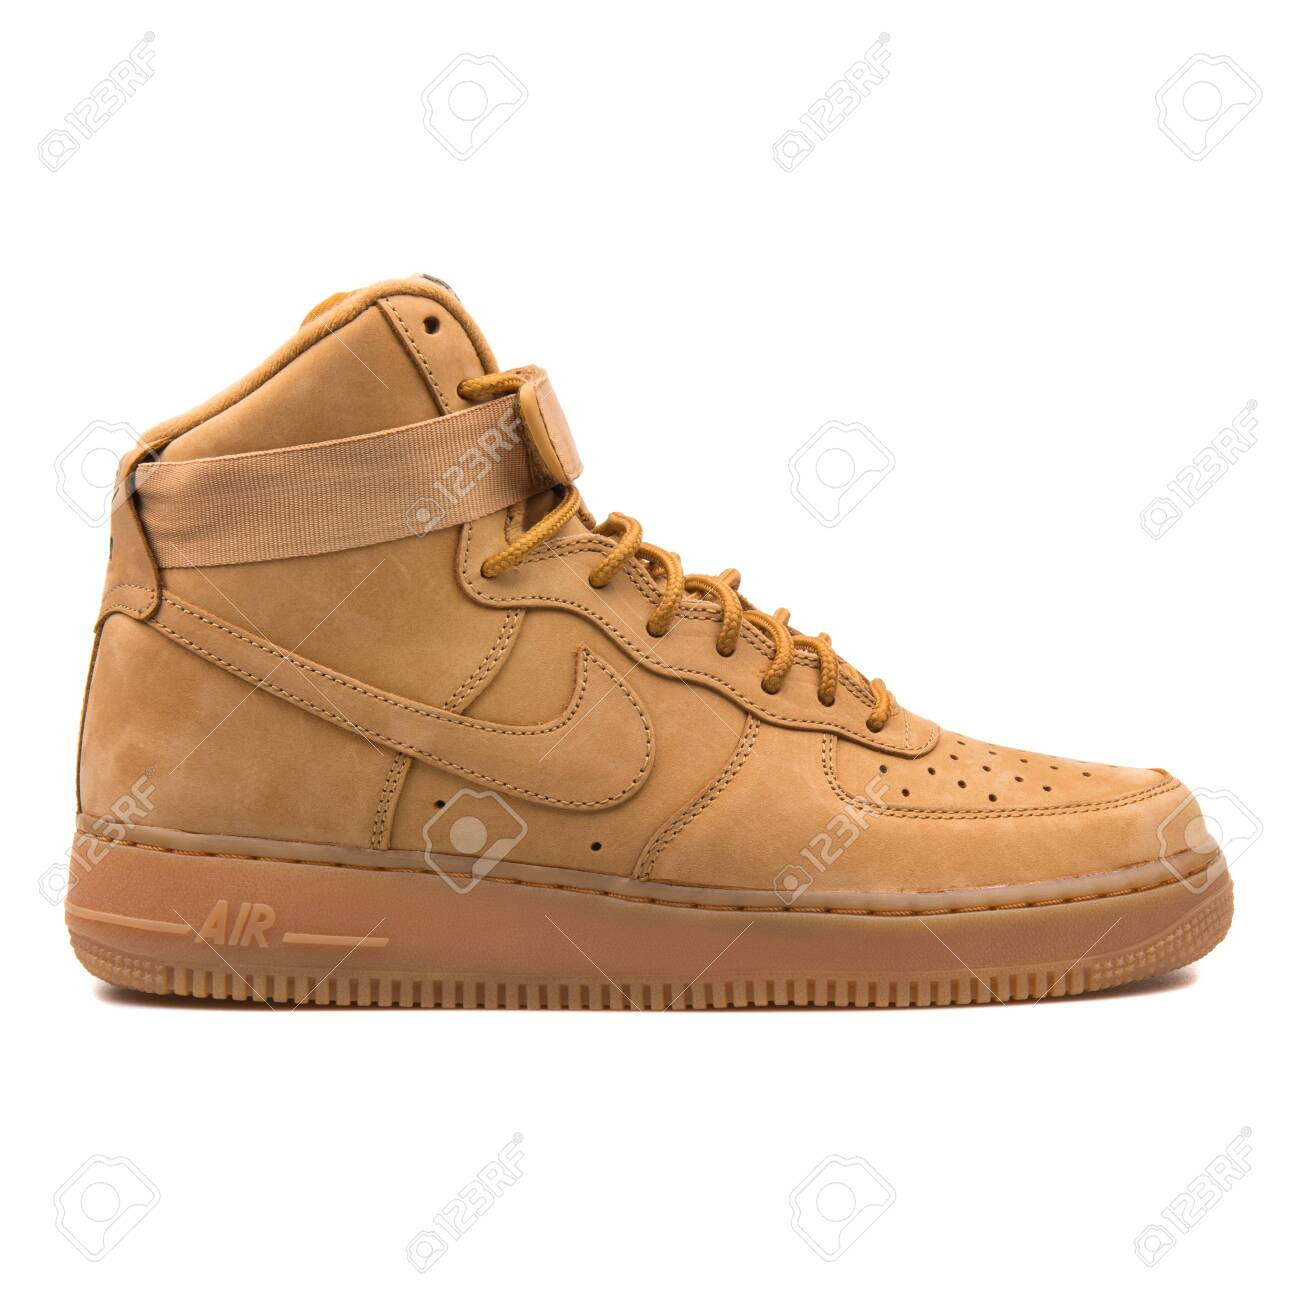 25. Nike Air Force 1 High